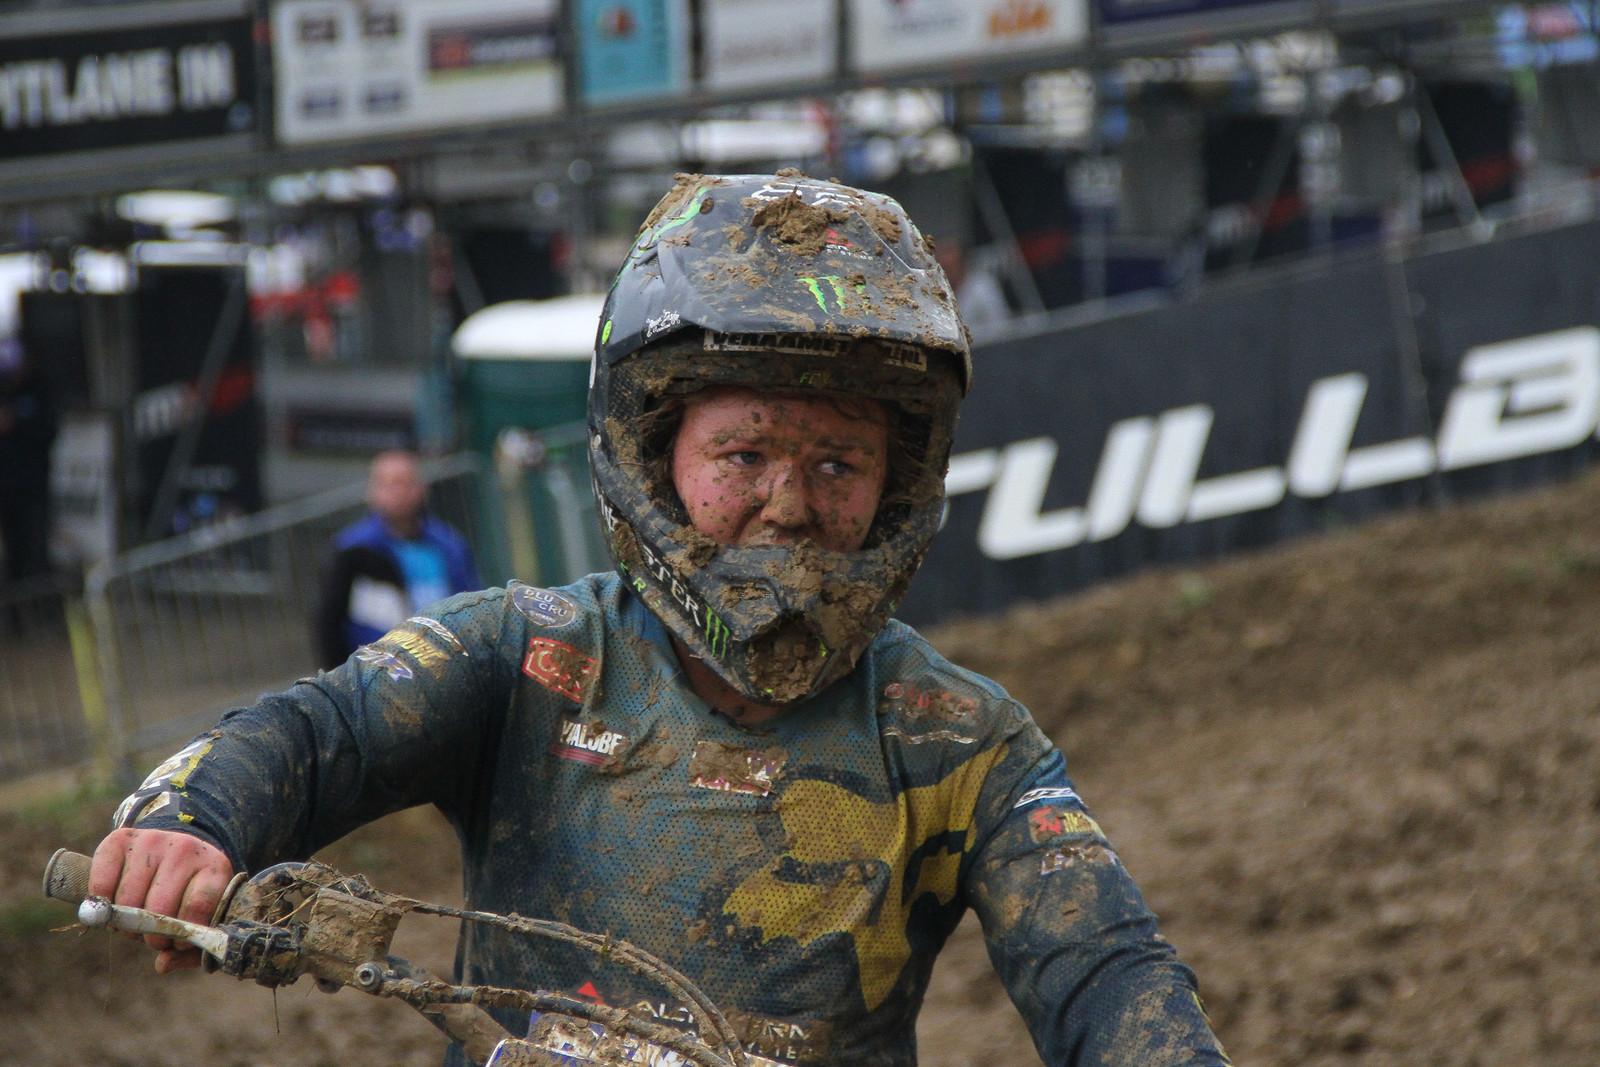 Courtney Duncan - ayearinmx - Motocross Pictures - Vital MX